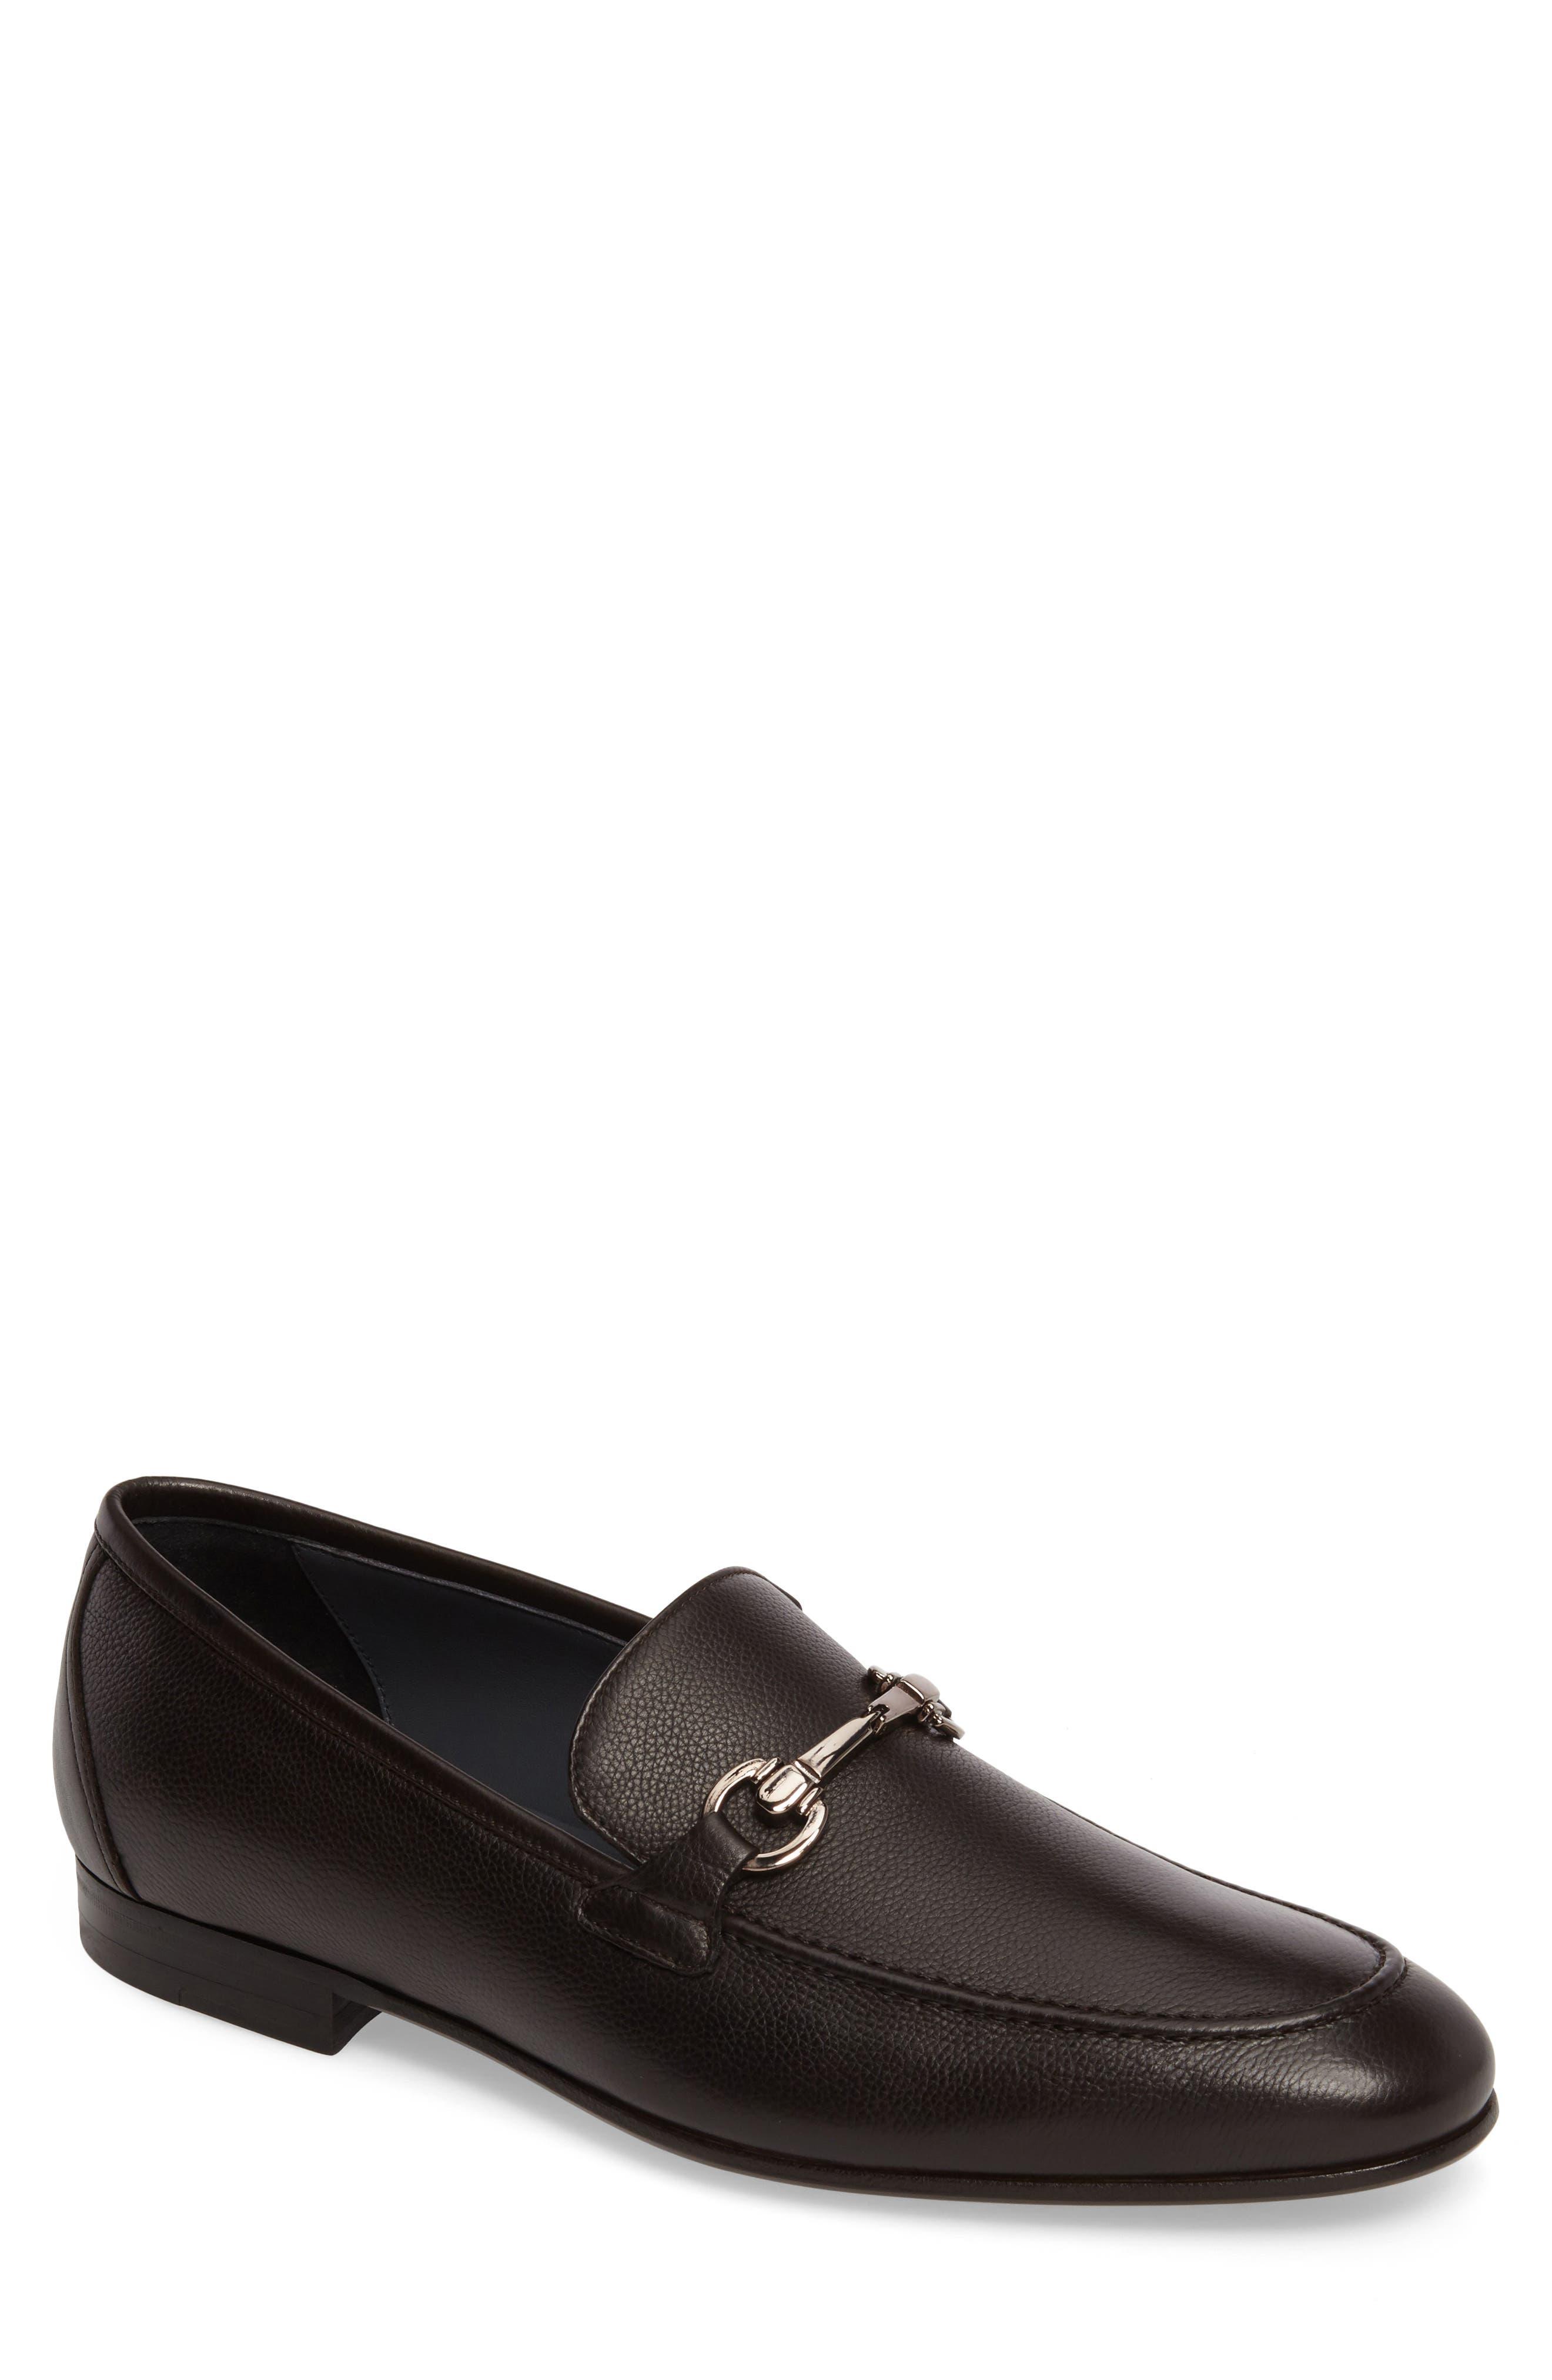 Brianza Bit Loafer,                         Main,                         color, Dark Brown Leather